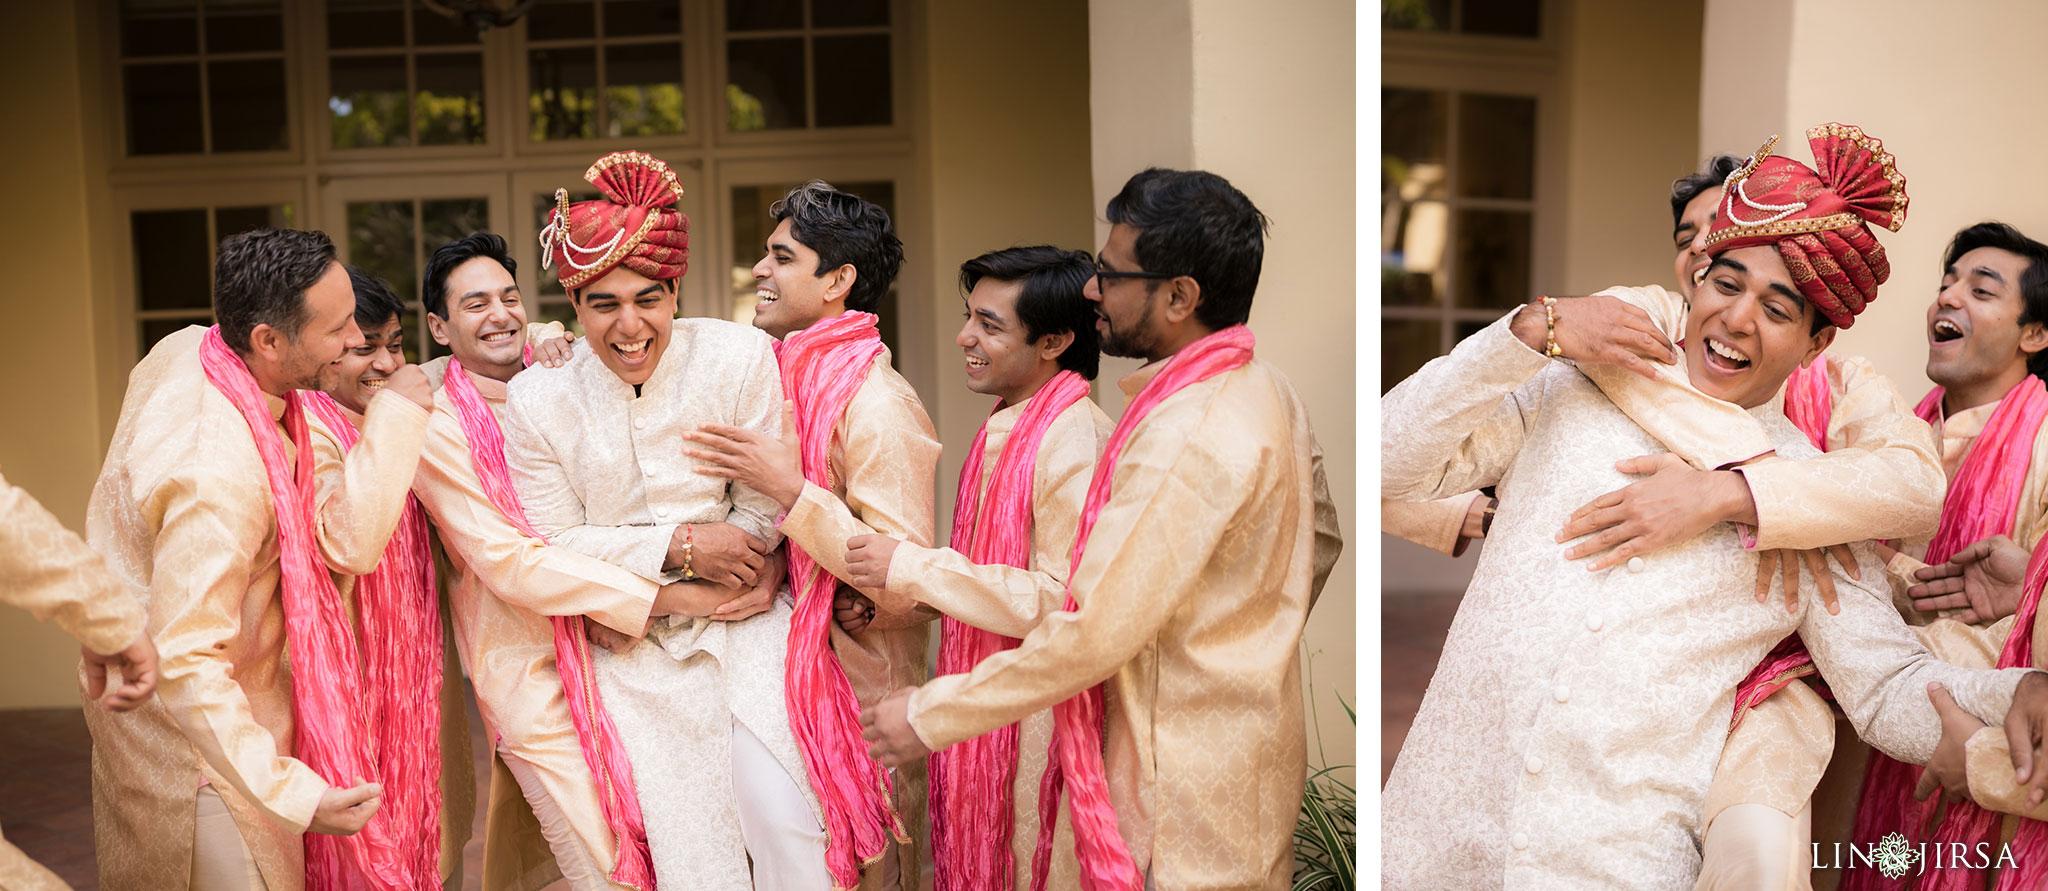 13 ritz carlton laguna niguel indian groomsmen wedding photography